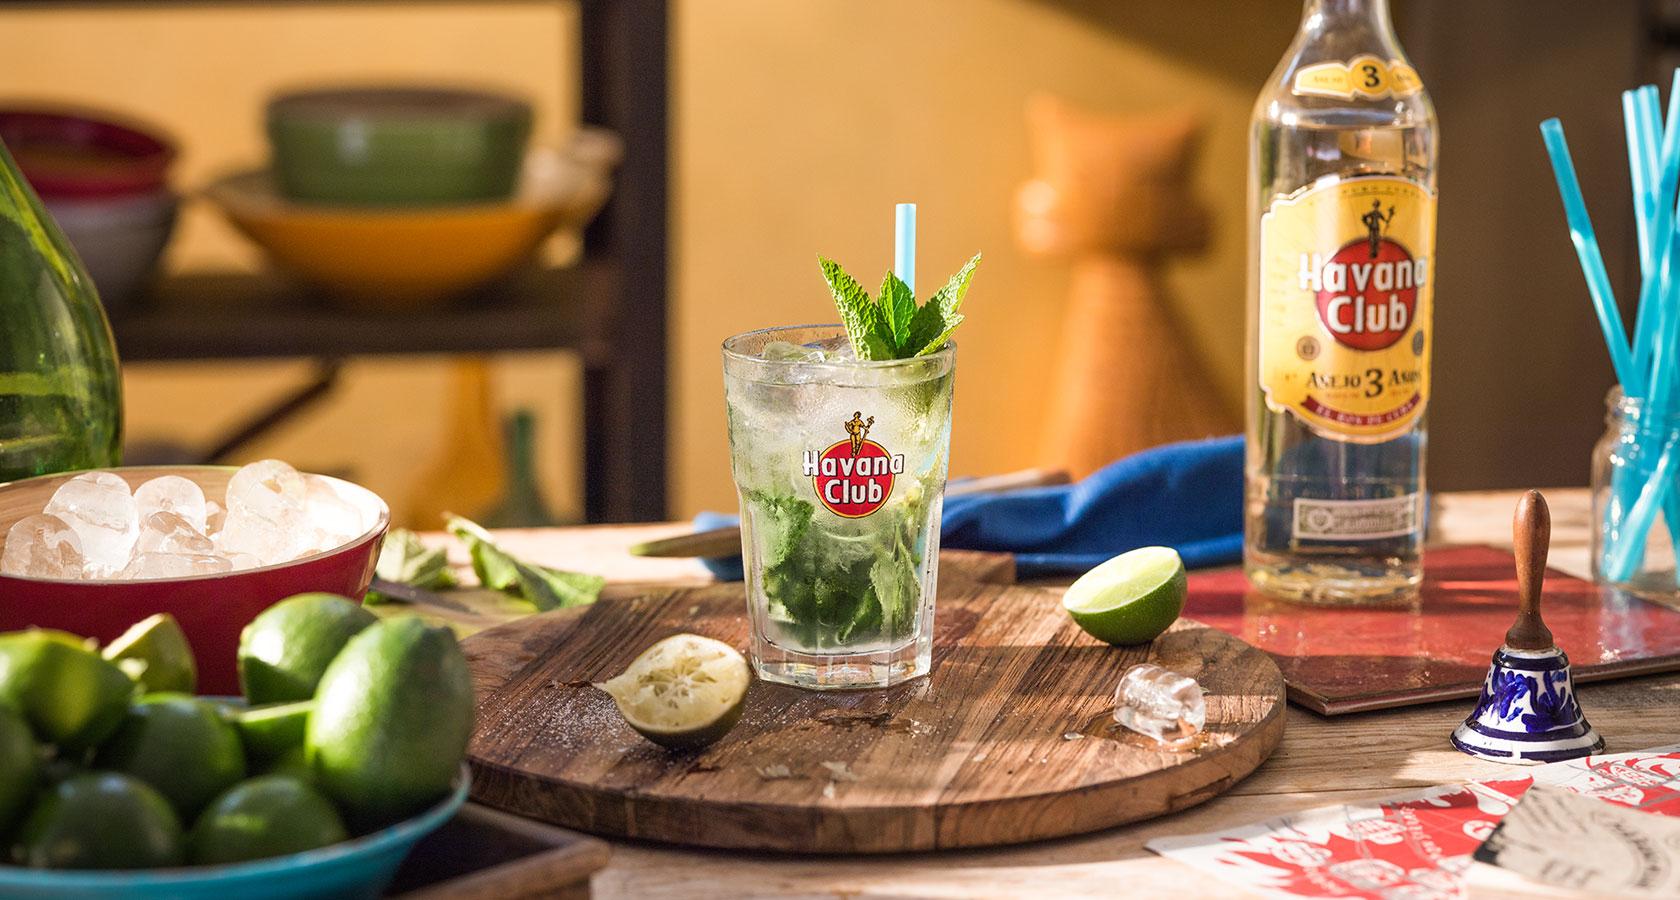 Cuba Drinking Age